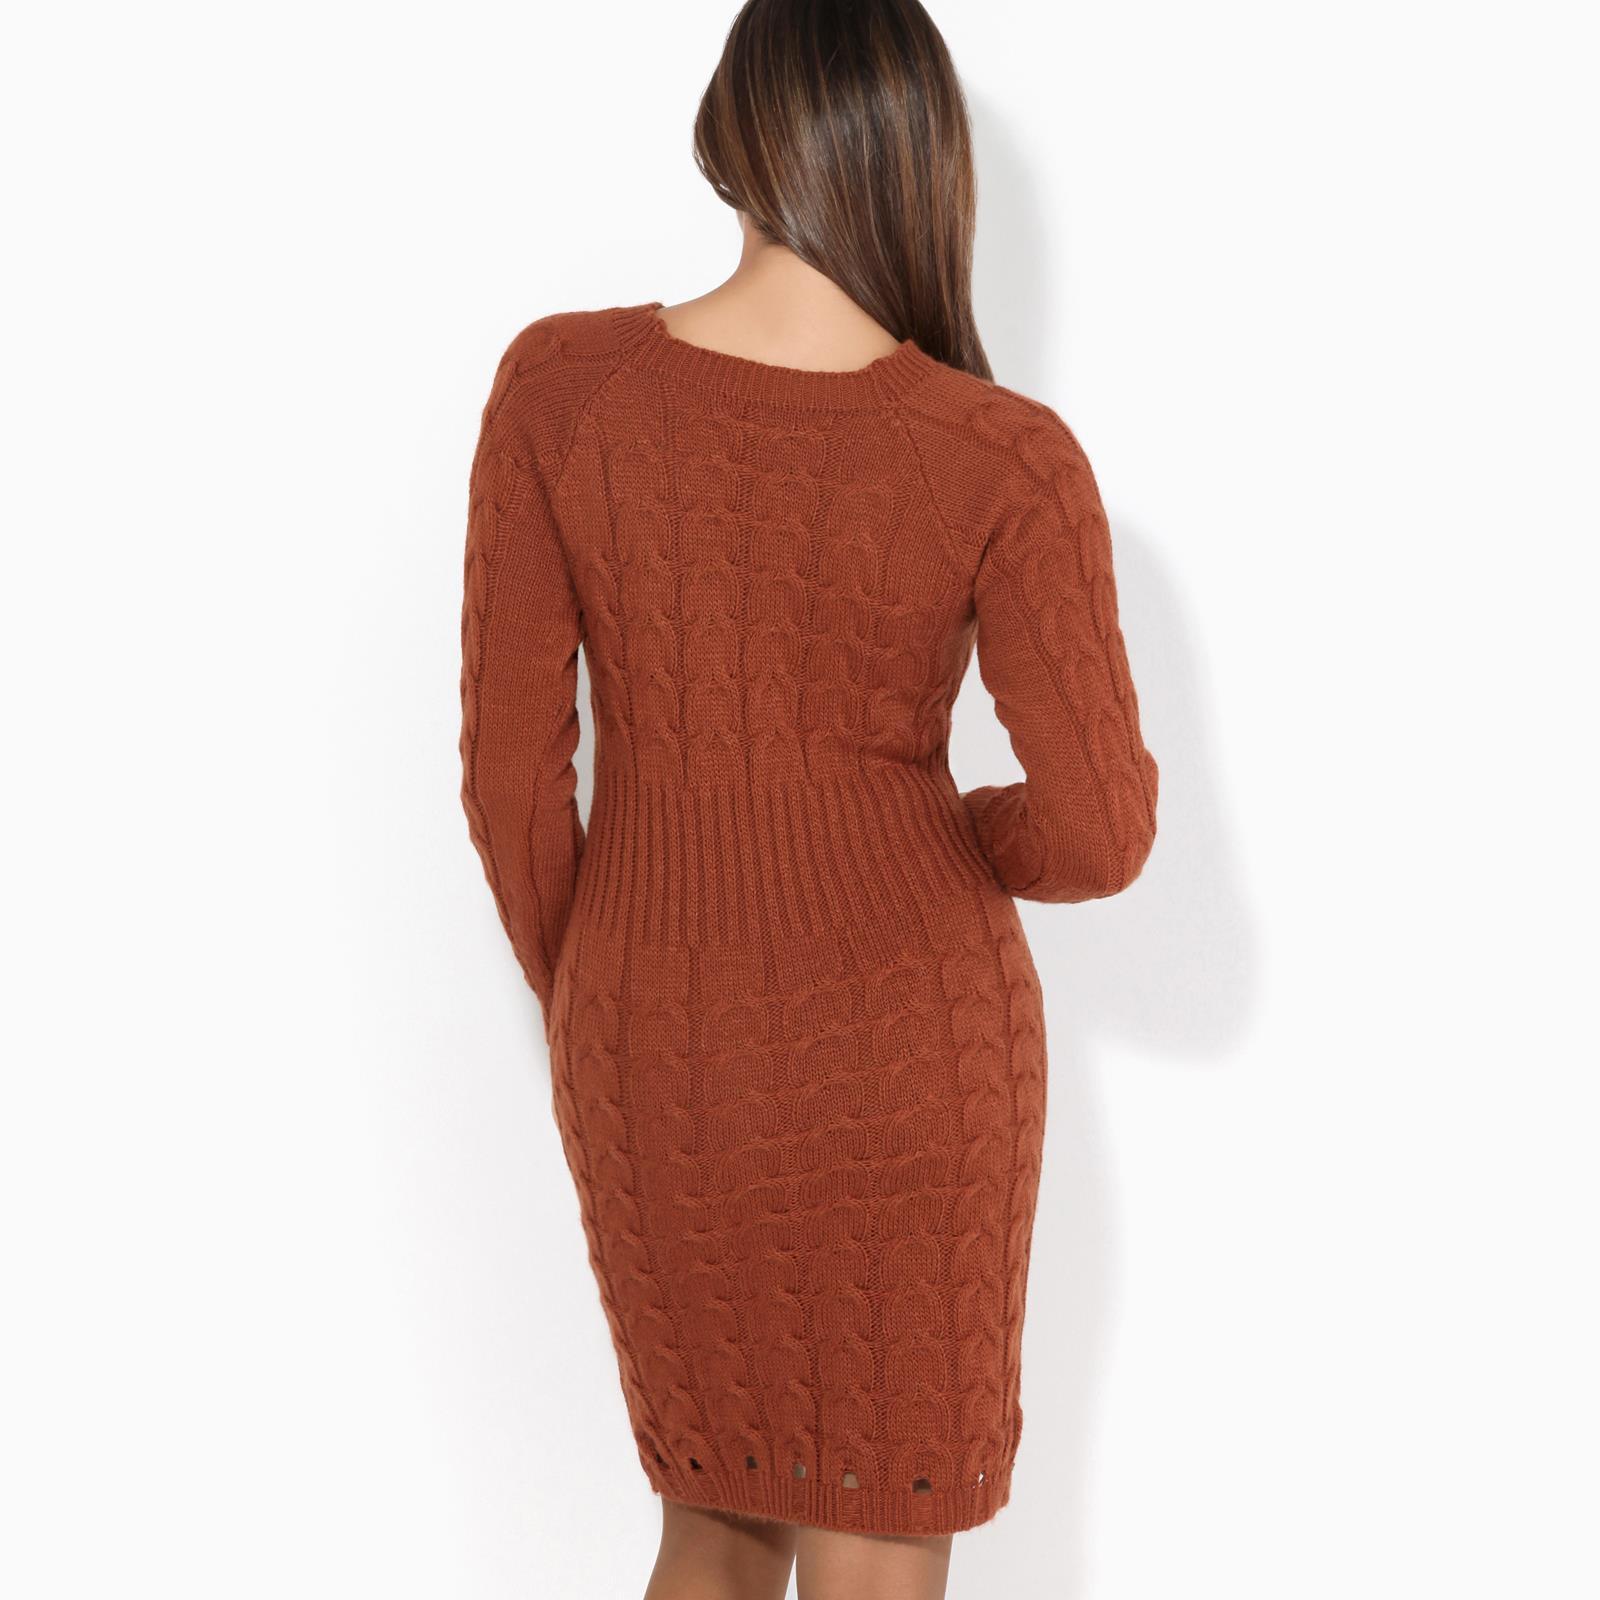 Womens-Ladies-Jumper-Dress-Longsleeve-Mini-Warm-Winter-Knit-Top-Bodycon thumbnail 19